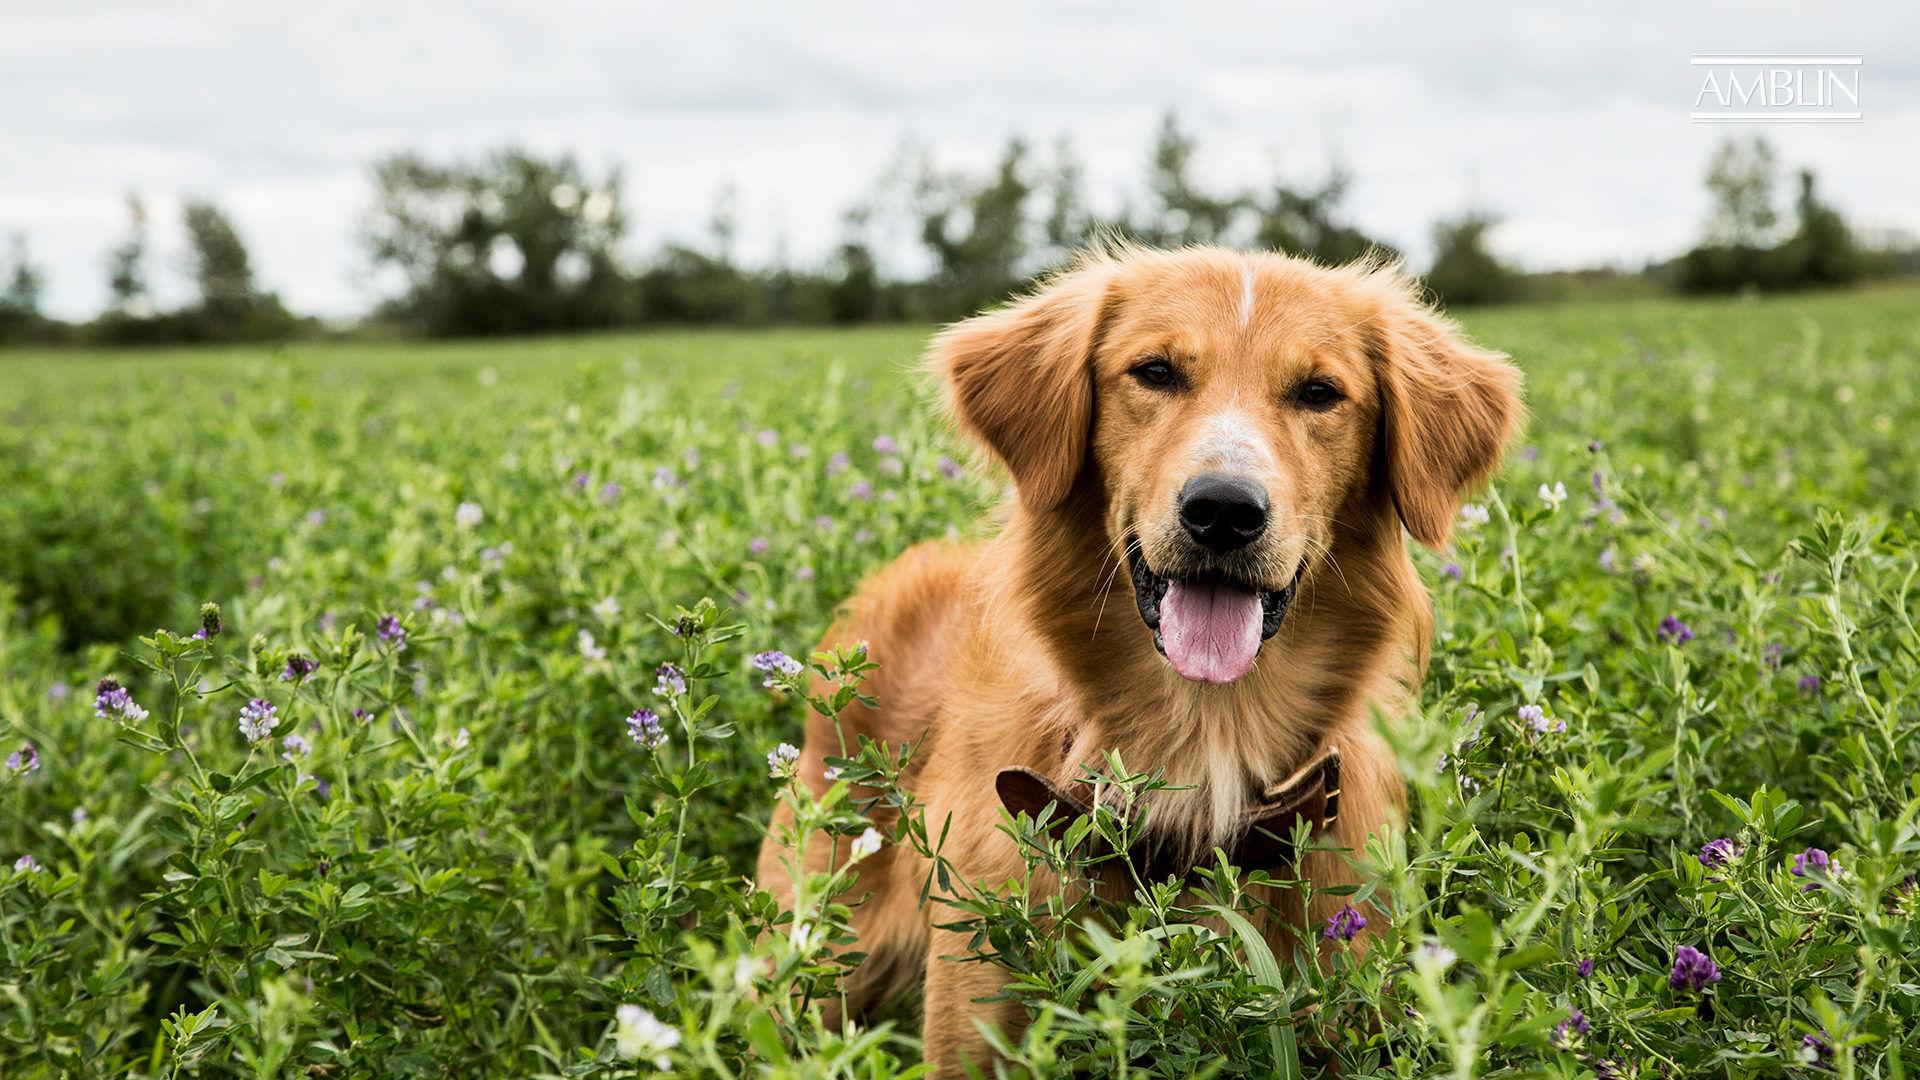 Amblin Partners Begins Principal Photography On A Dog S Journey Amblin Press